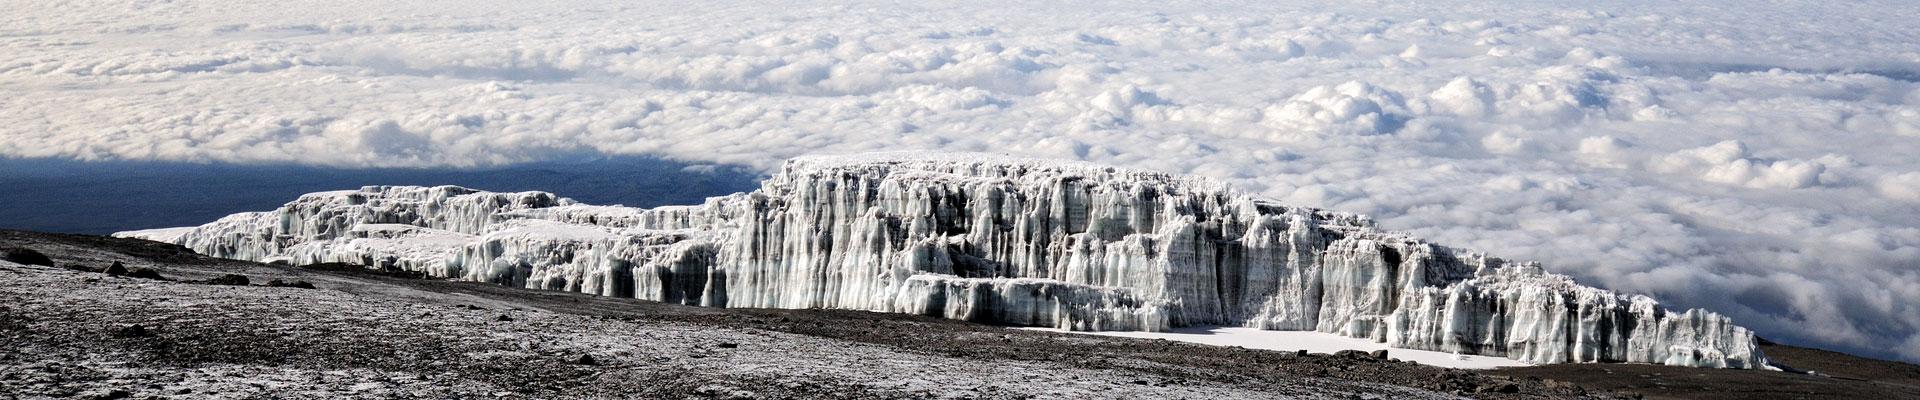 Top image champ de glace Sud Kilimandjaro